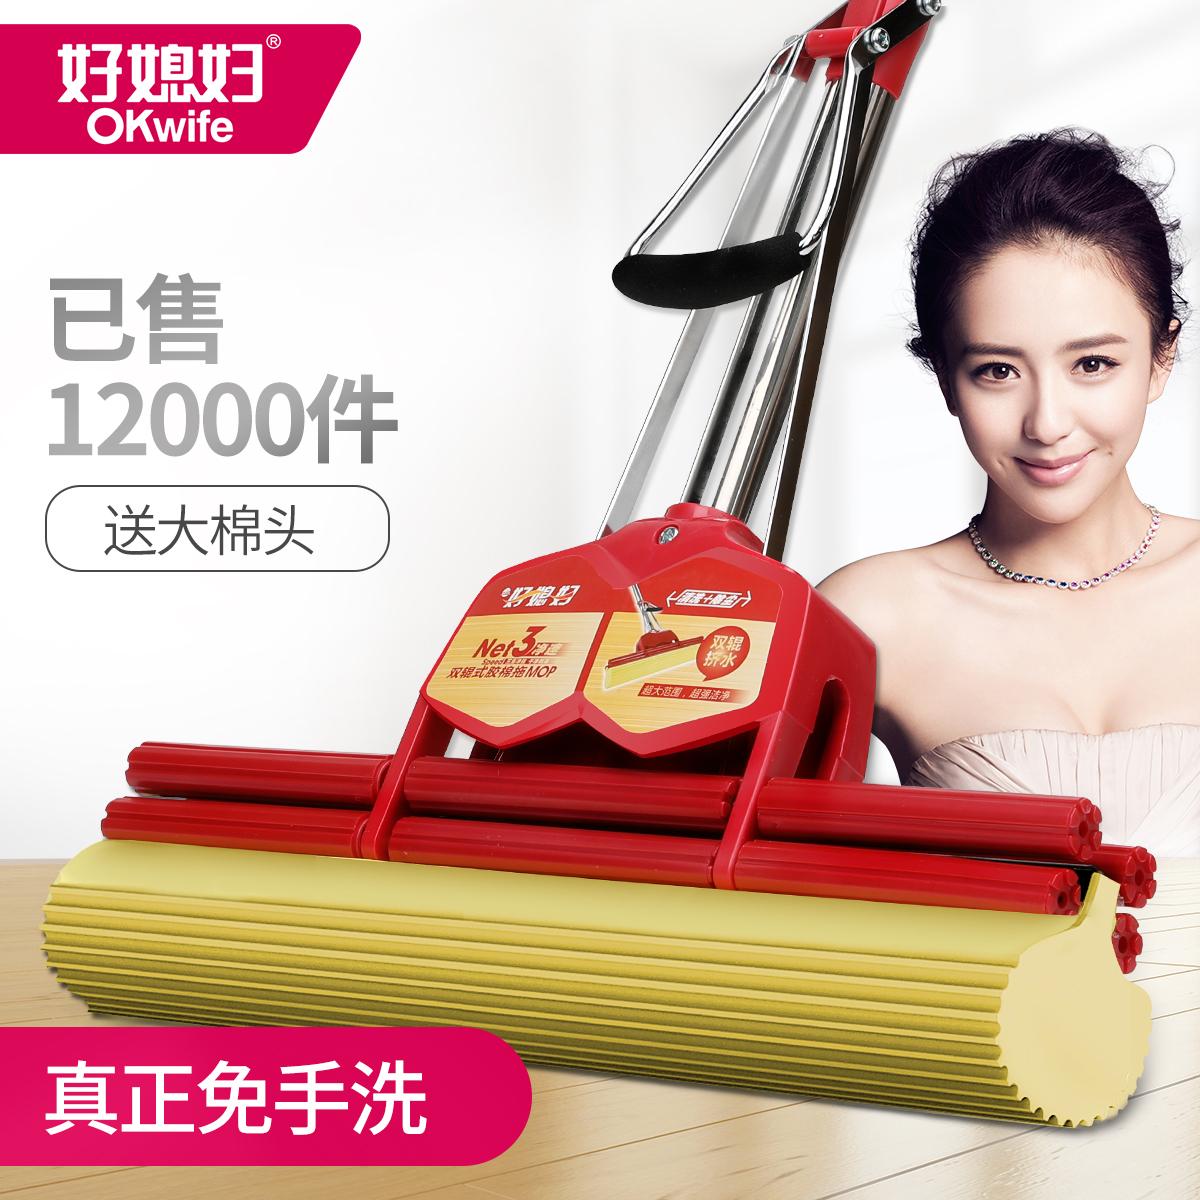 HY韩国进口 日用品 米时代大米护发素 正常发质使用550g(750g)